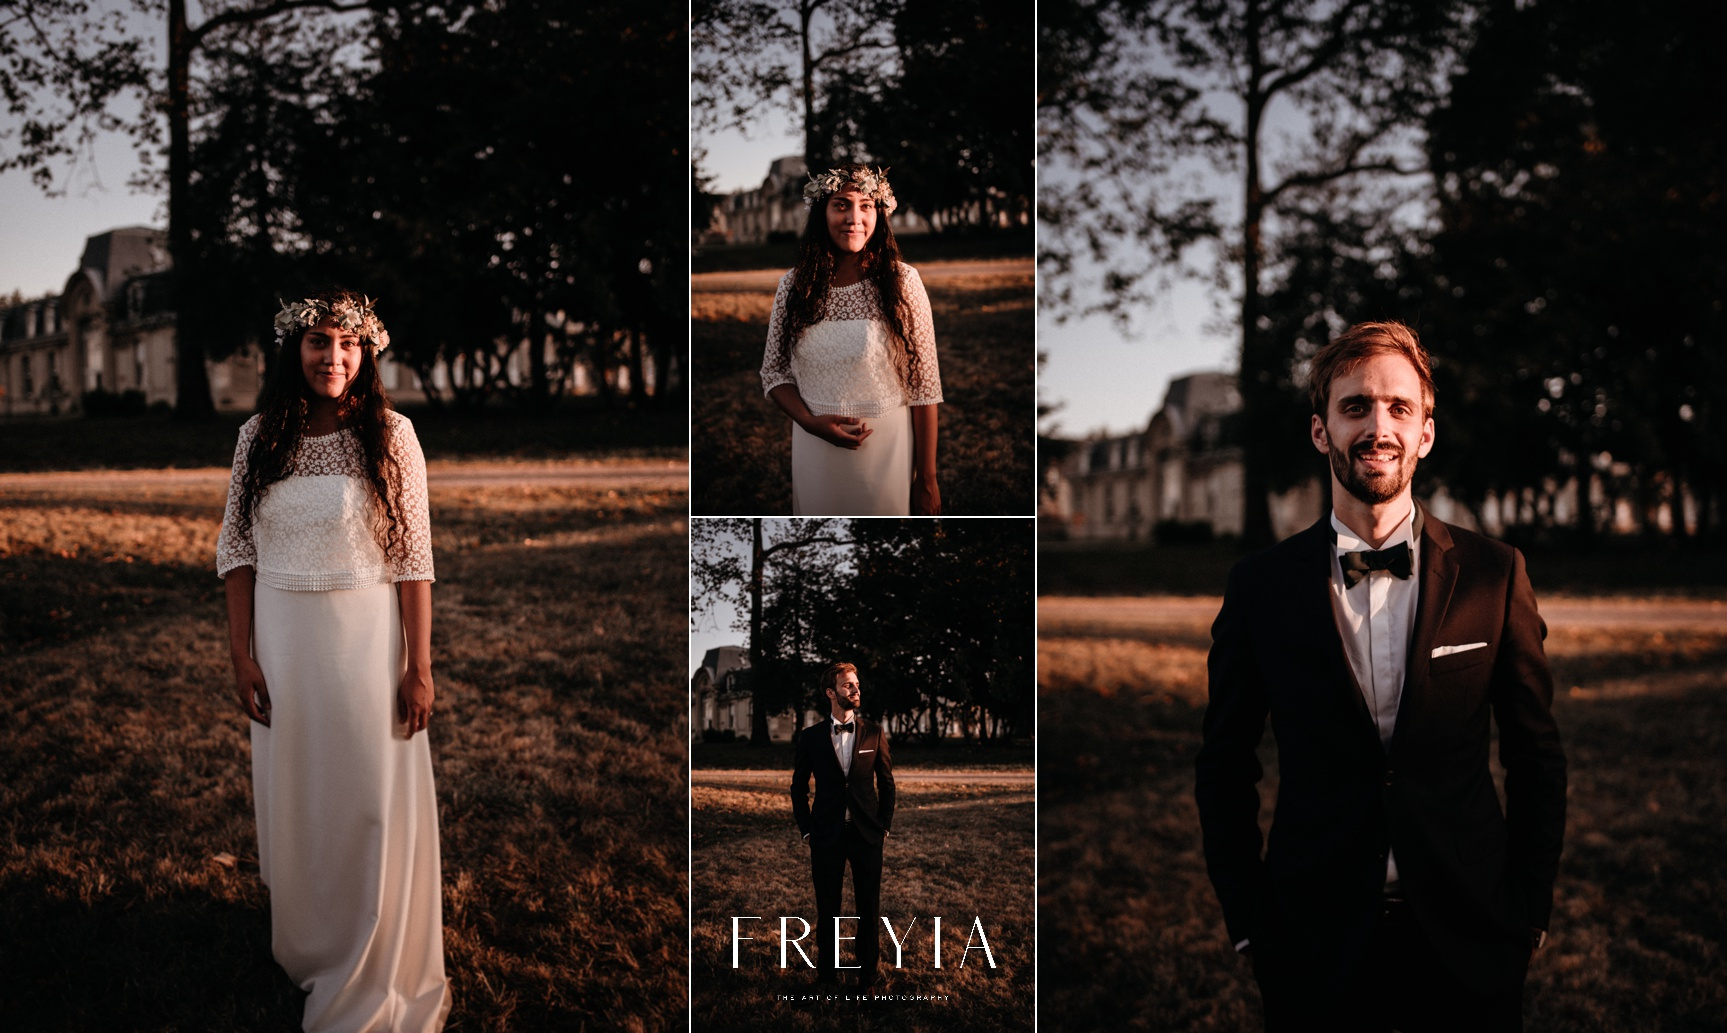 R + T |  mariage reportage alternatif moody intime minimaliste vintage naturel boho boheme |  PHOTOGRAPHE mariage PARIS france destination  | FREYIA photography_-332.jpg